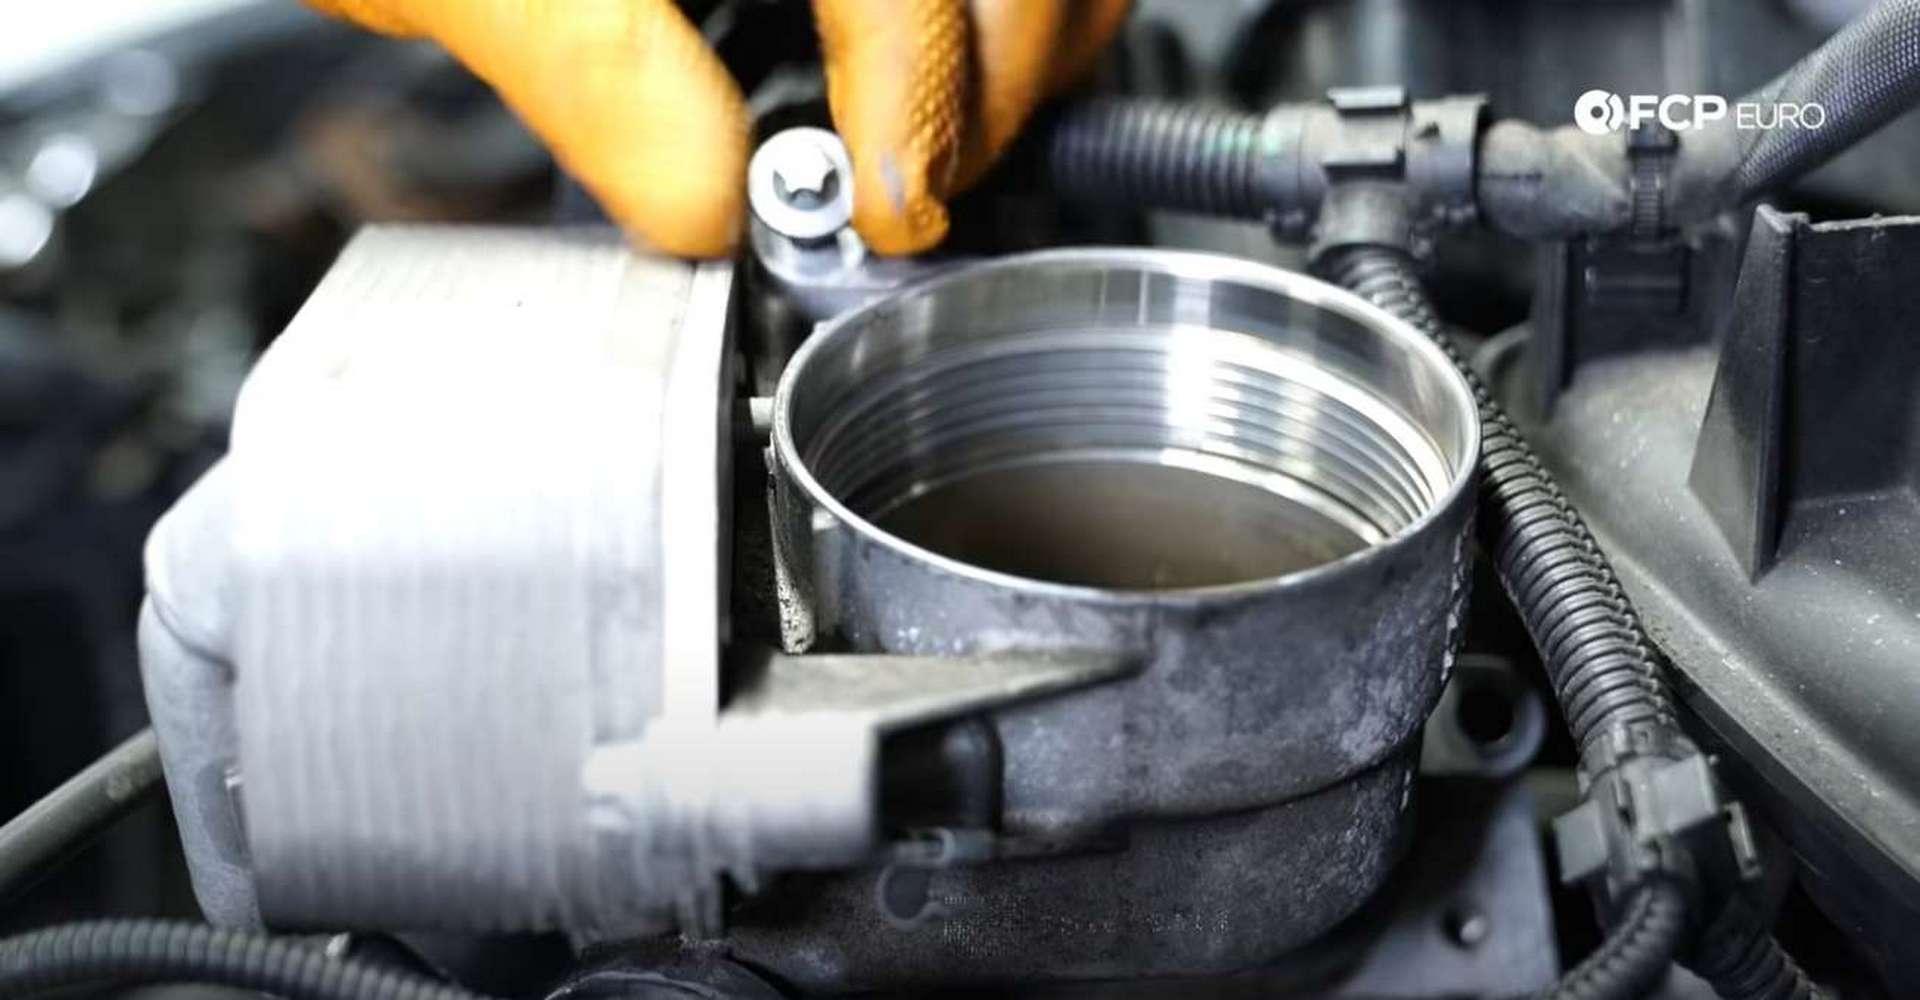 DIY BMW F30 Oil Filter Housing Gasket Replacement remaining oil filter housing bolt location